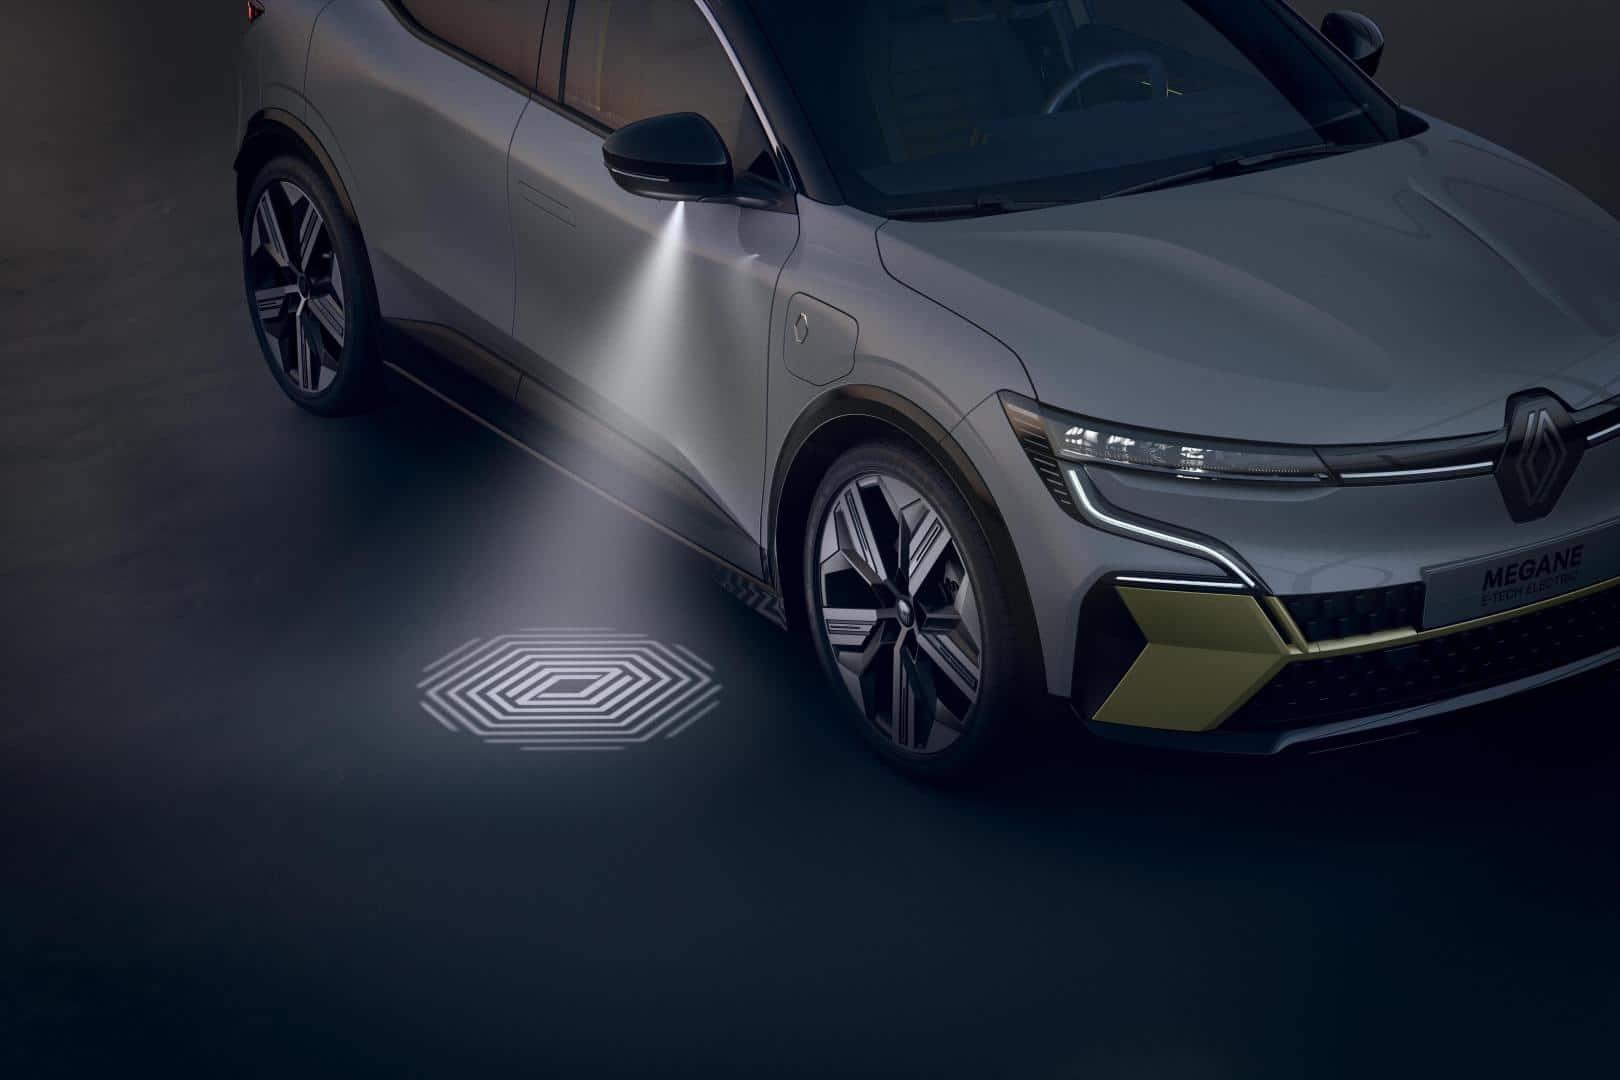 Einstiegsbeleuchtung beim Renault Mégane E-TECH Electric Autohaus Schouren